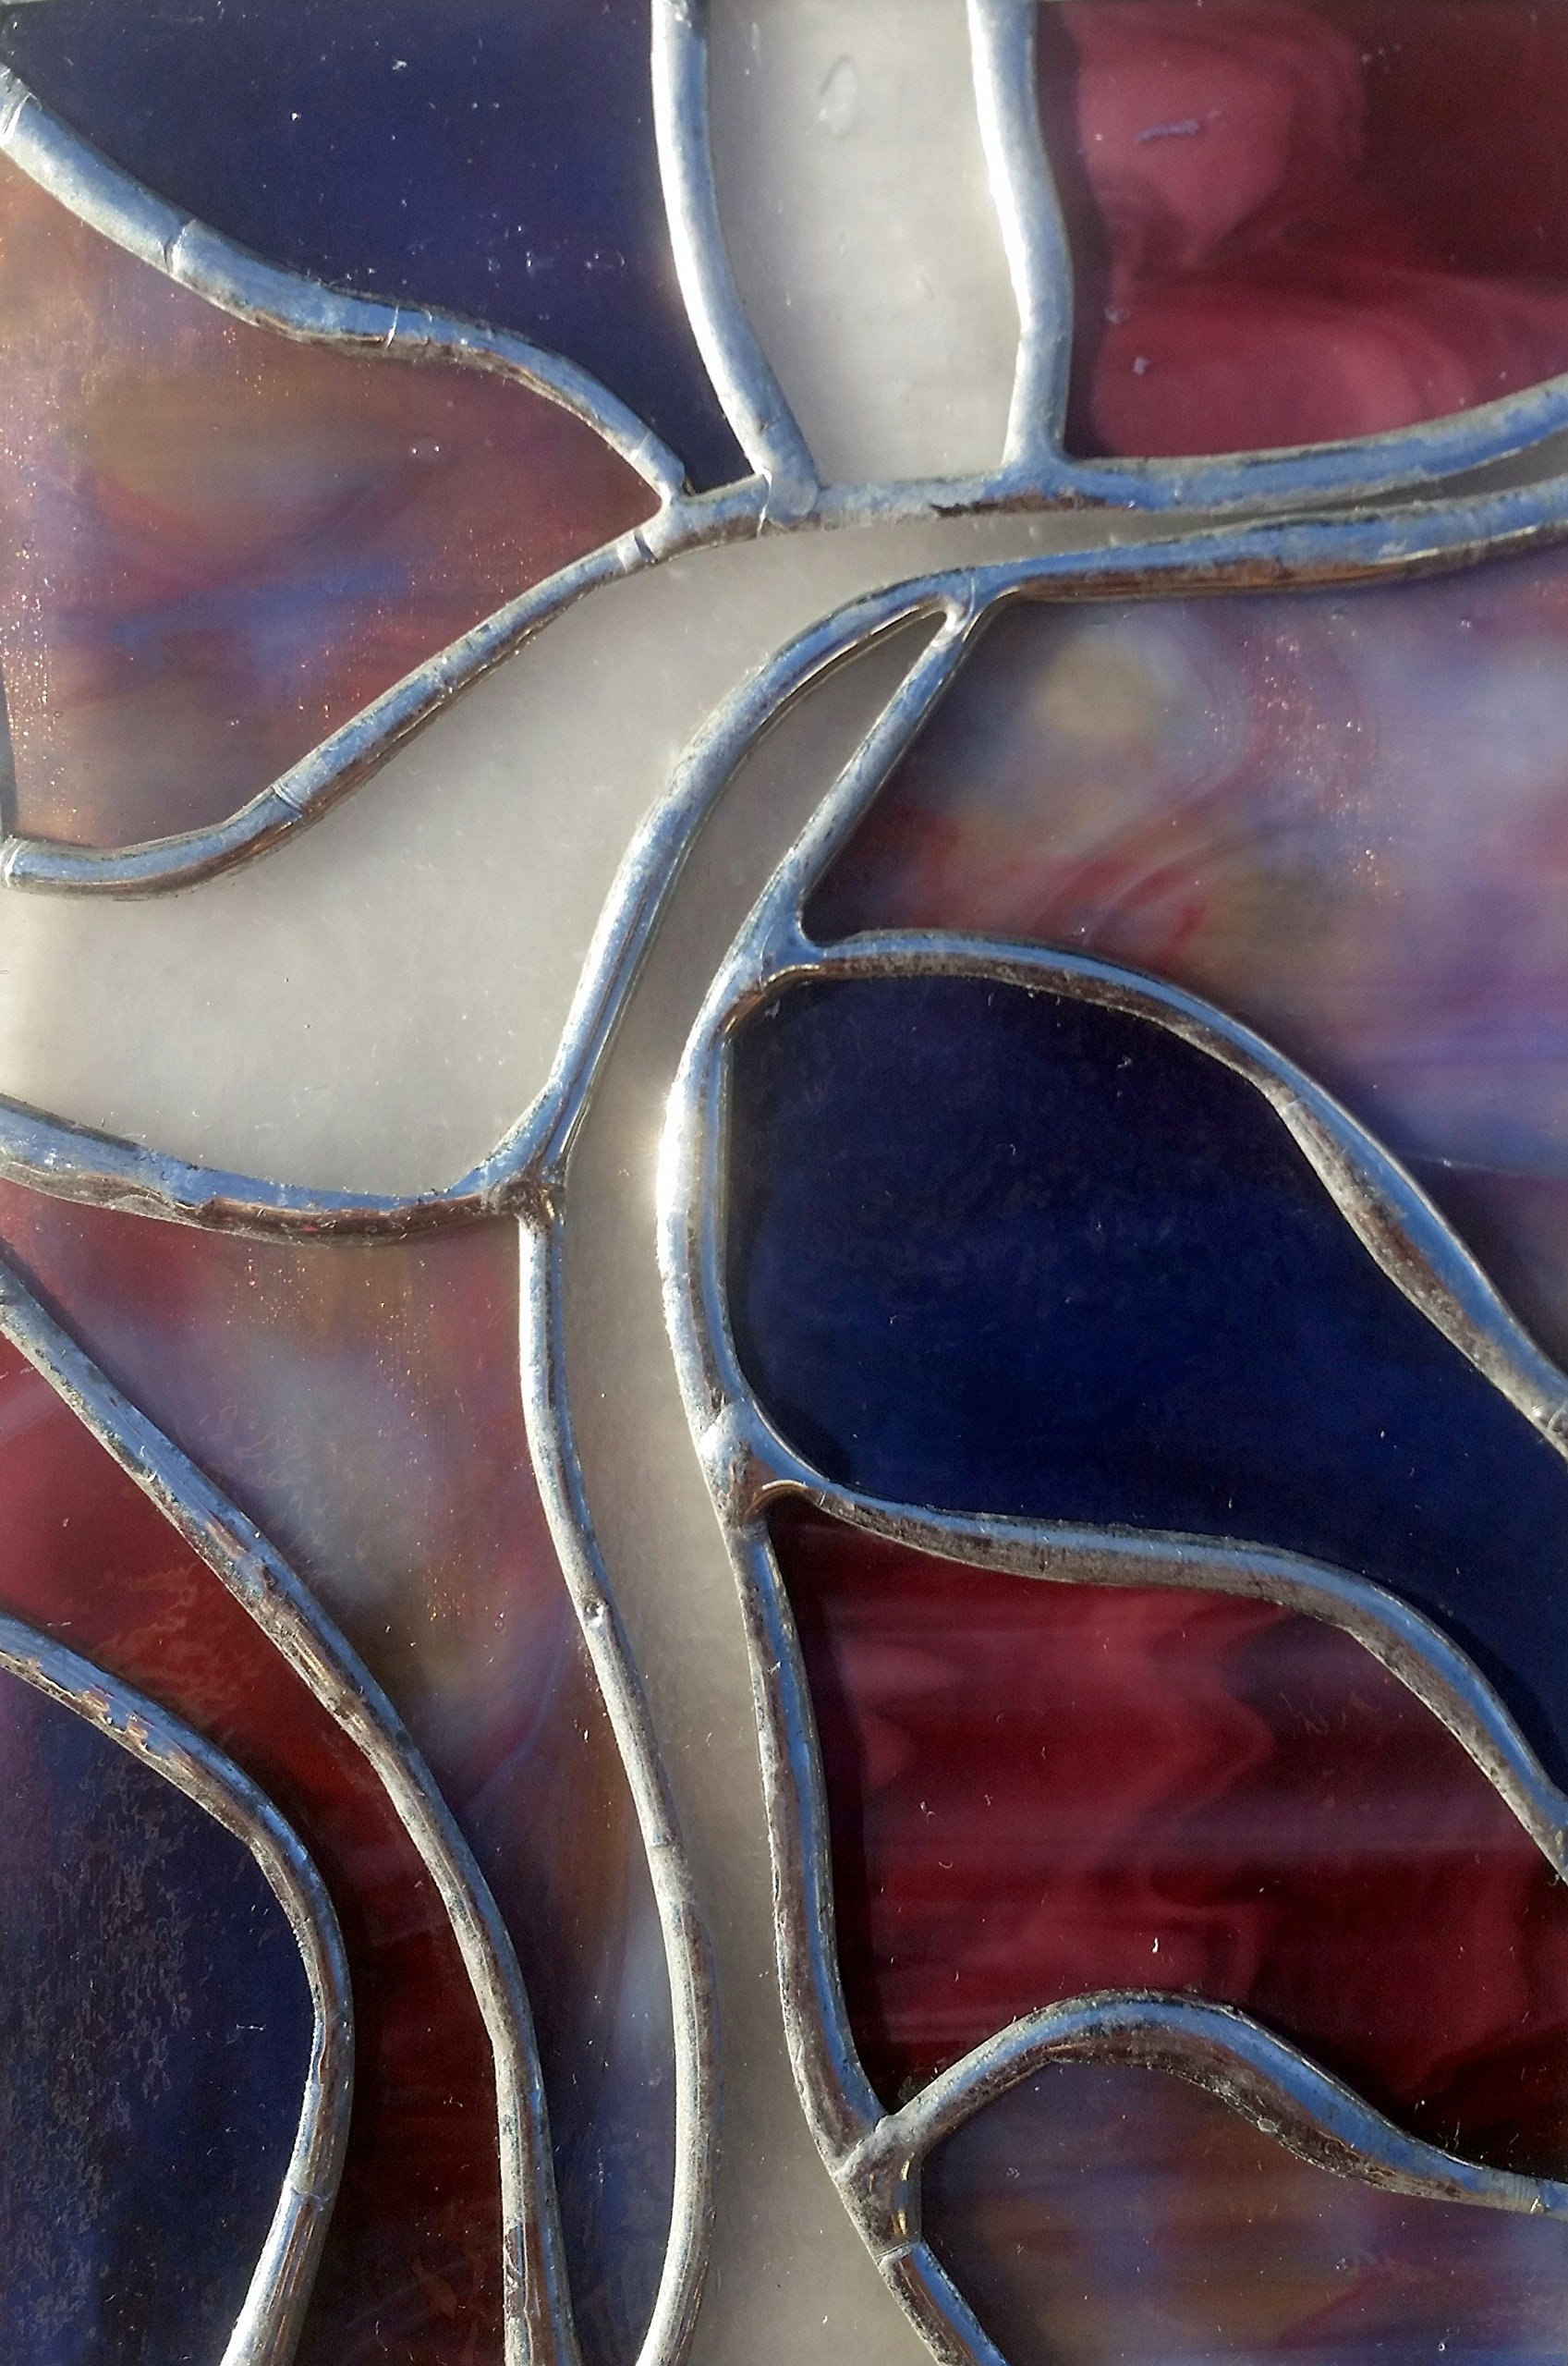 Handmade Stained Glass Abstract Art Cross Easter Suncatcher Window Spirit Ornament